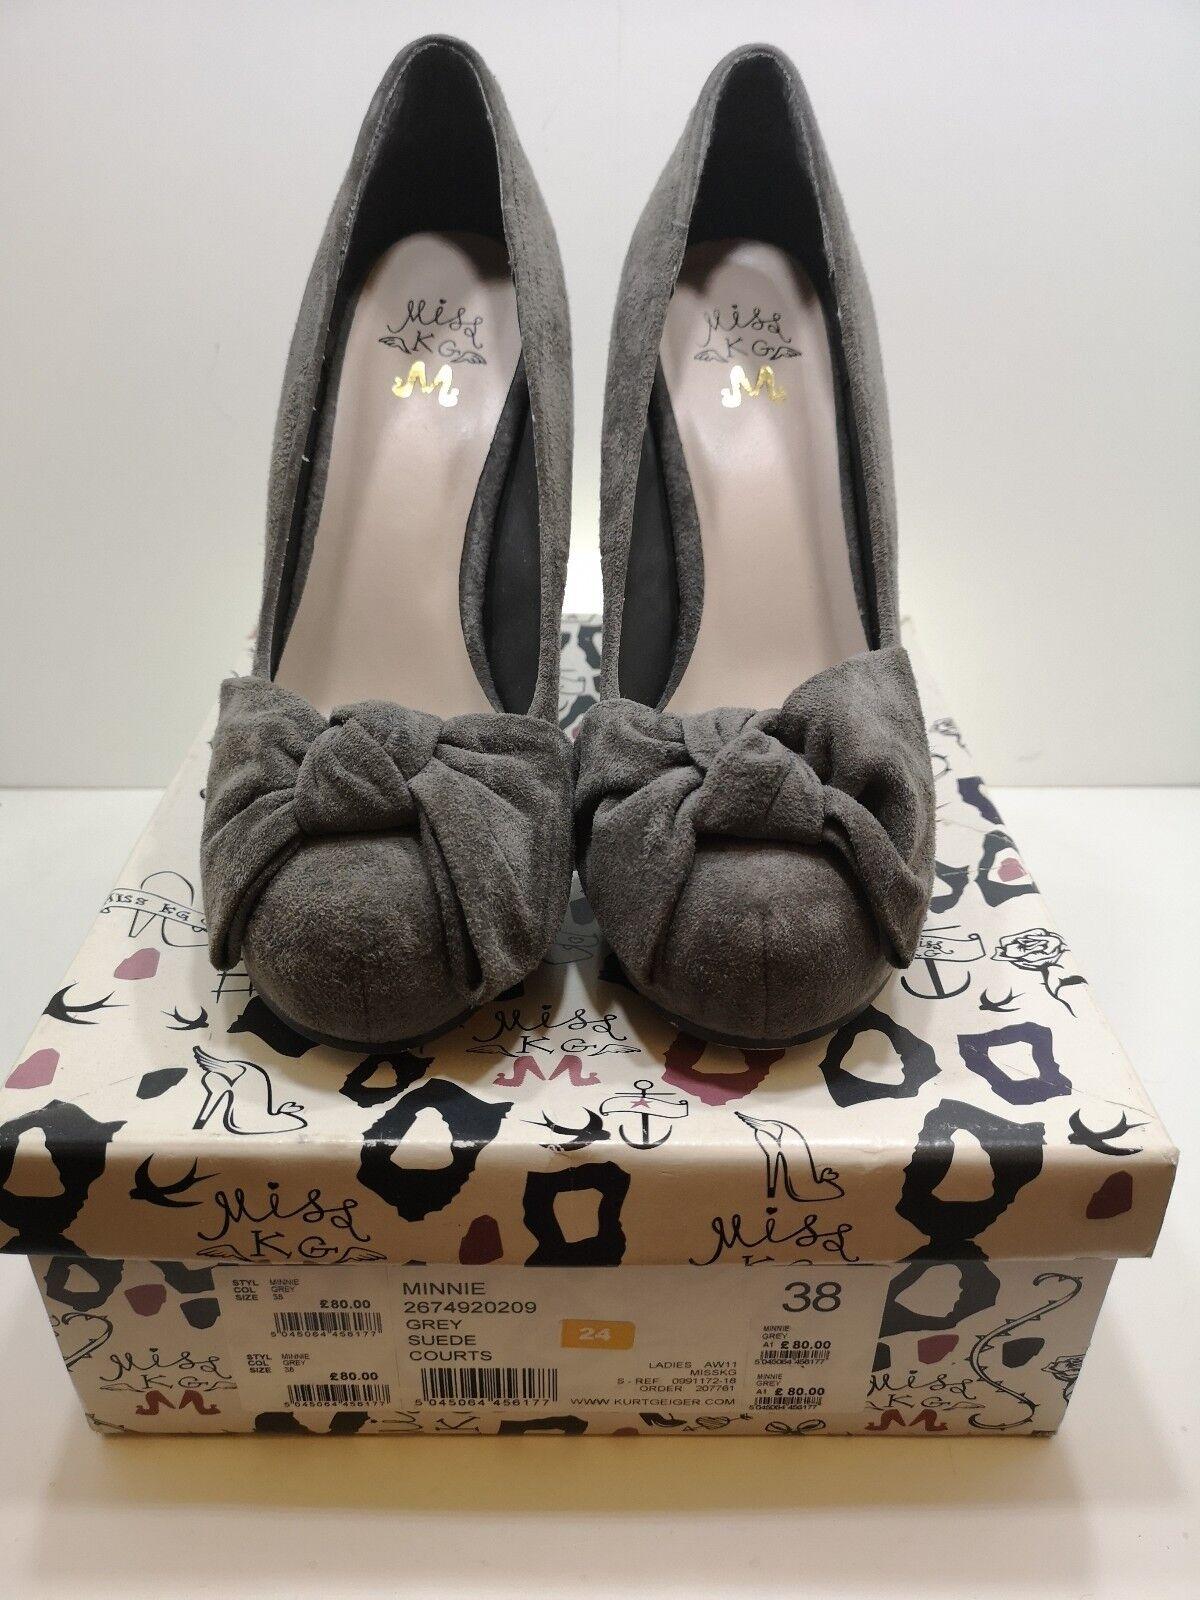 Miss KG Minnie schuhe- Größe 5 grau NEW- 50's Bow Vintage Style- Kurt Geiger Suede Bow 50's a2e85c